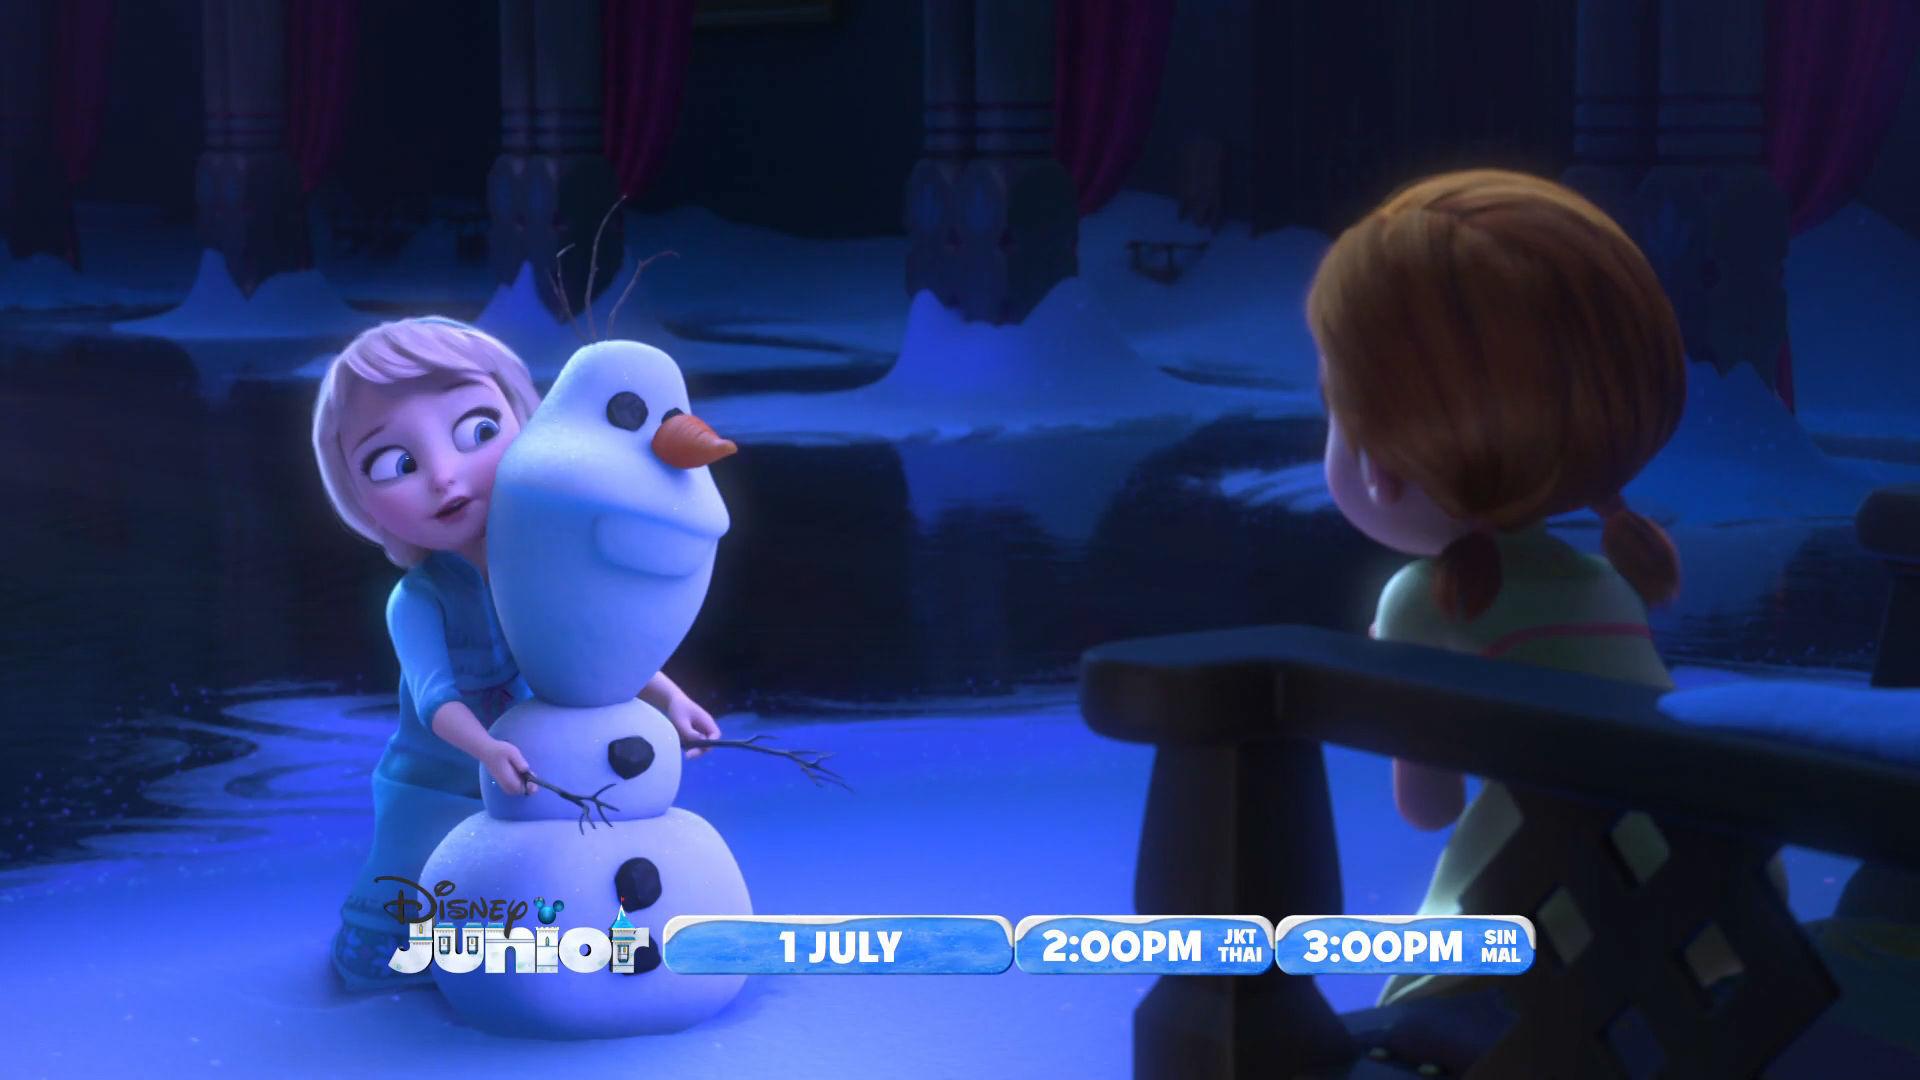 The Magical World of Disney Junior Presents - Frozen